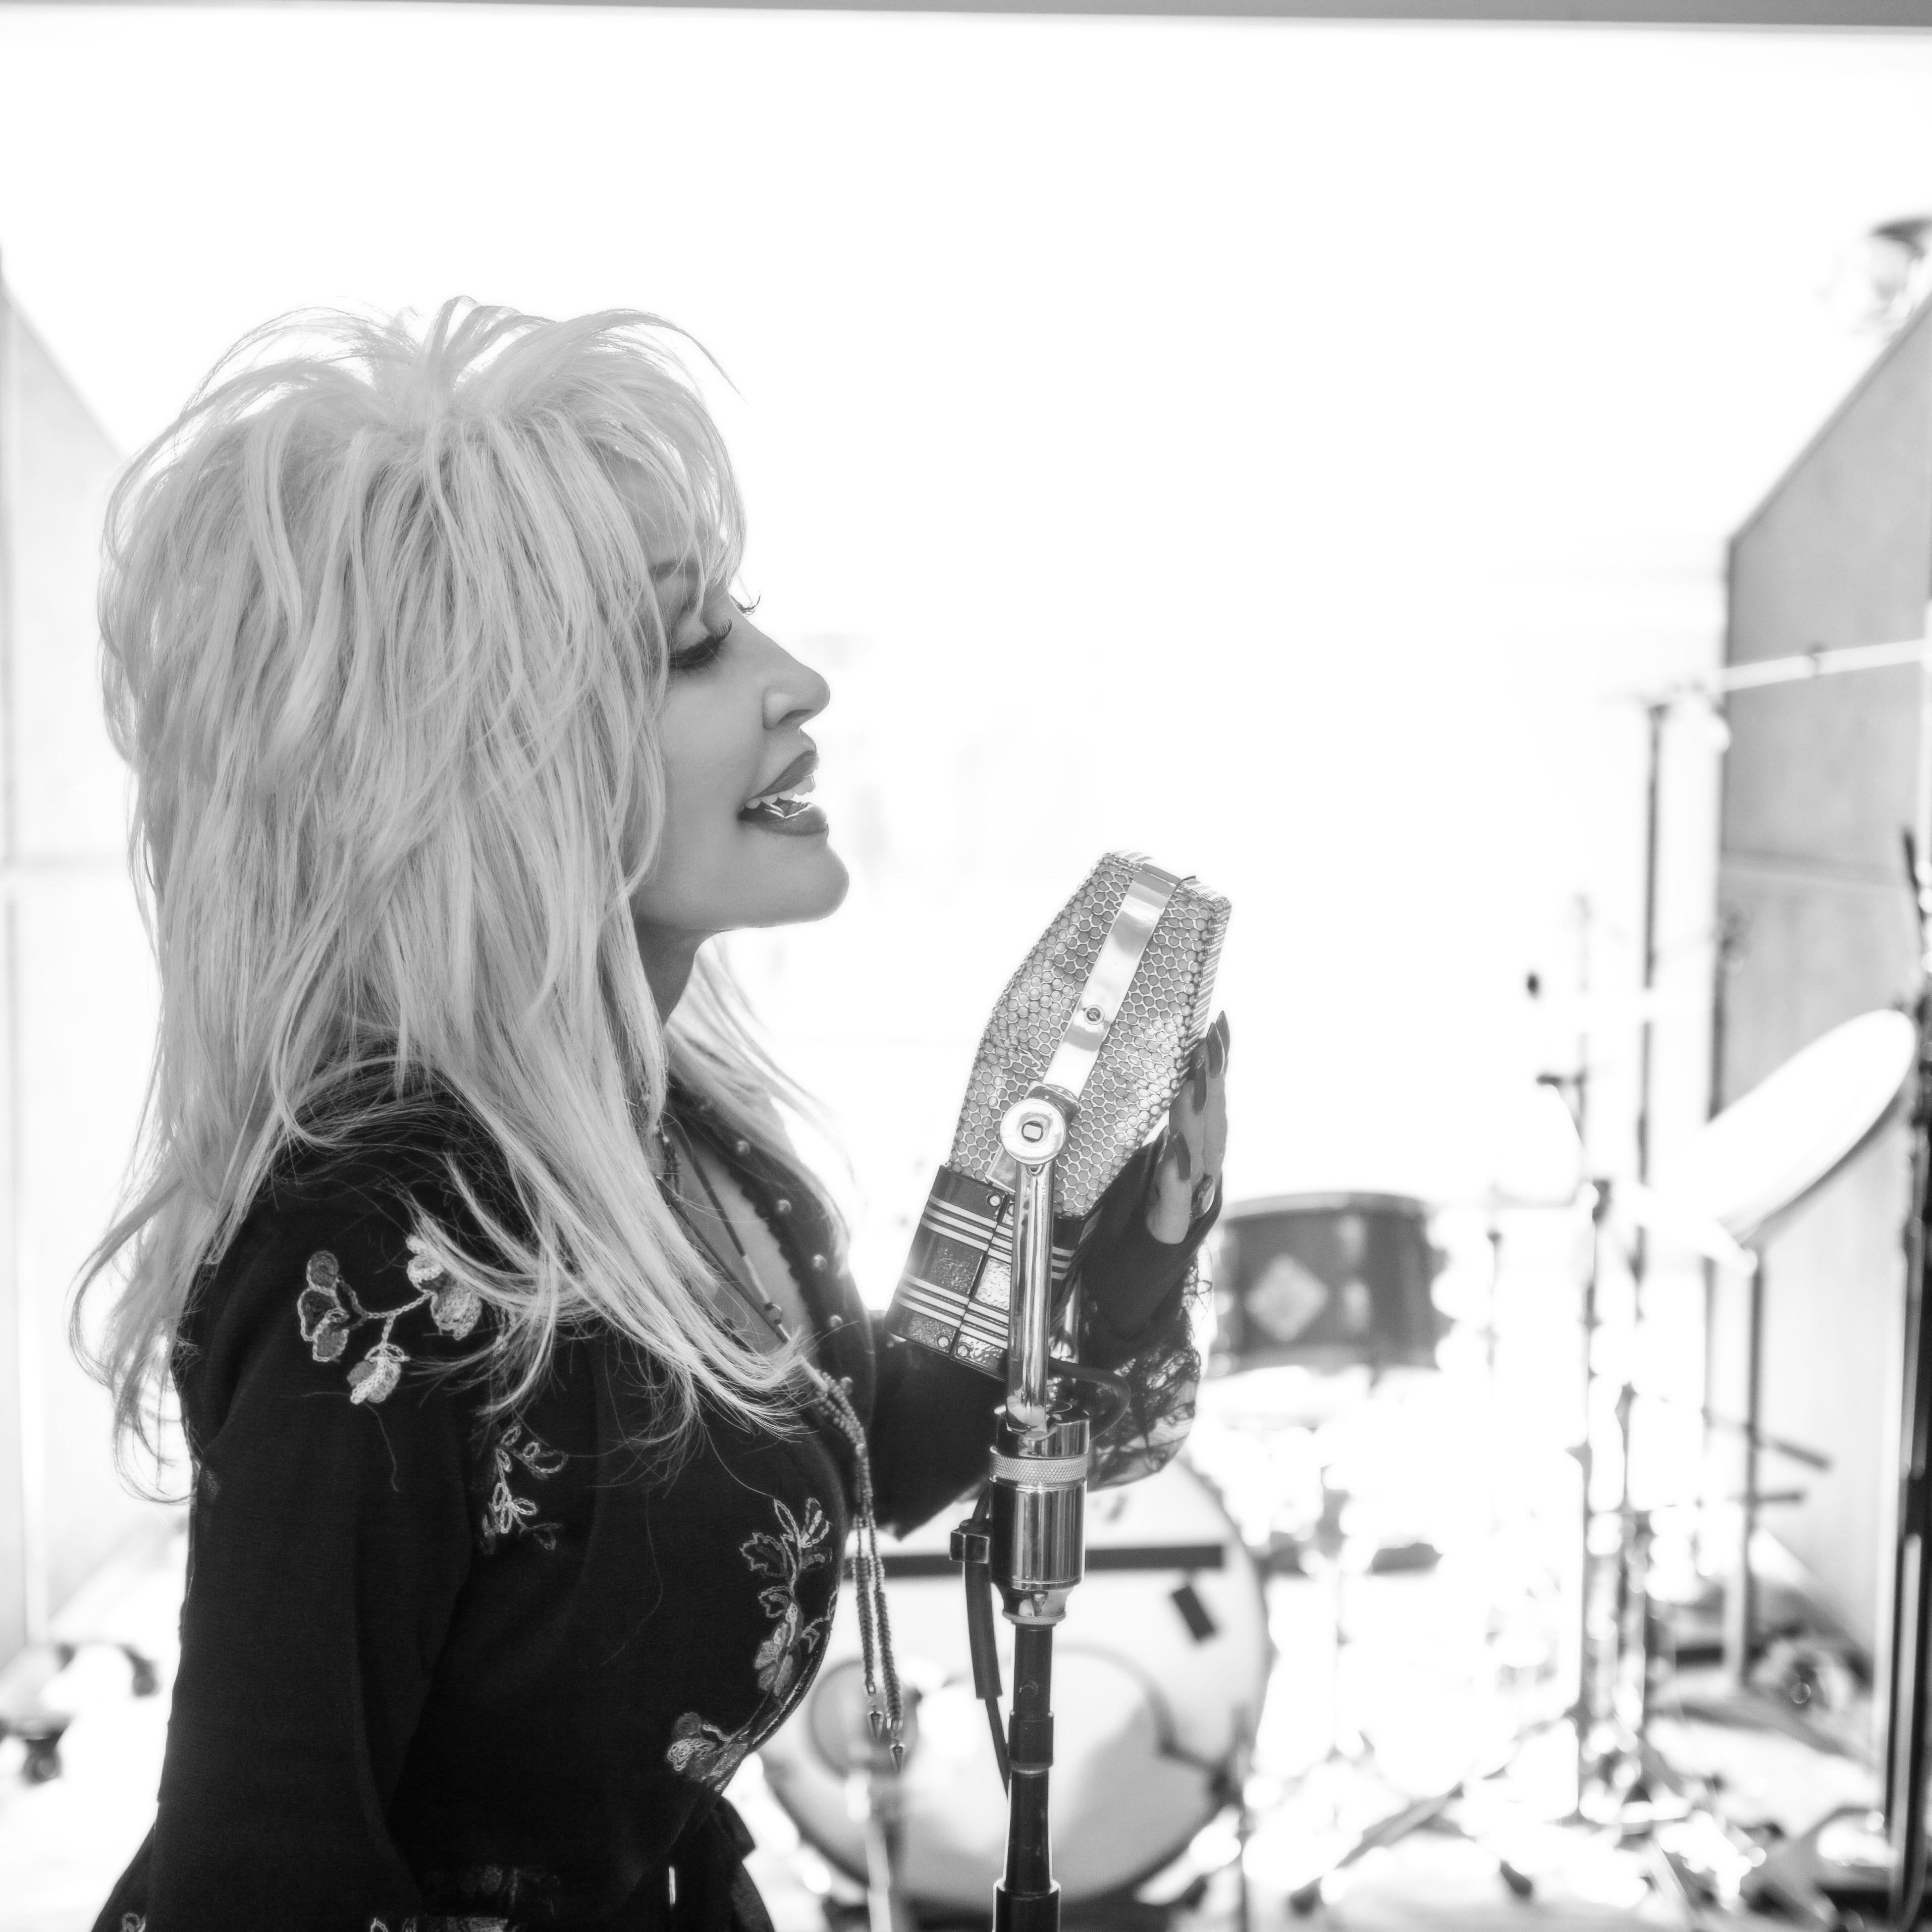 Dolly Parton recording a strain for Jennifer Aniston's film Dumplin.'